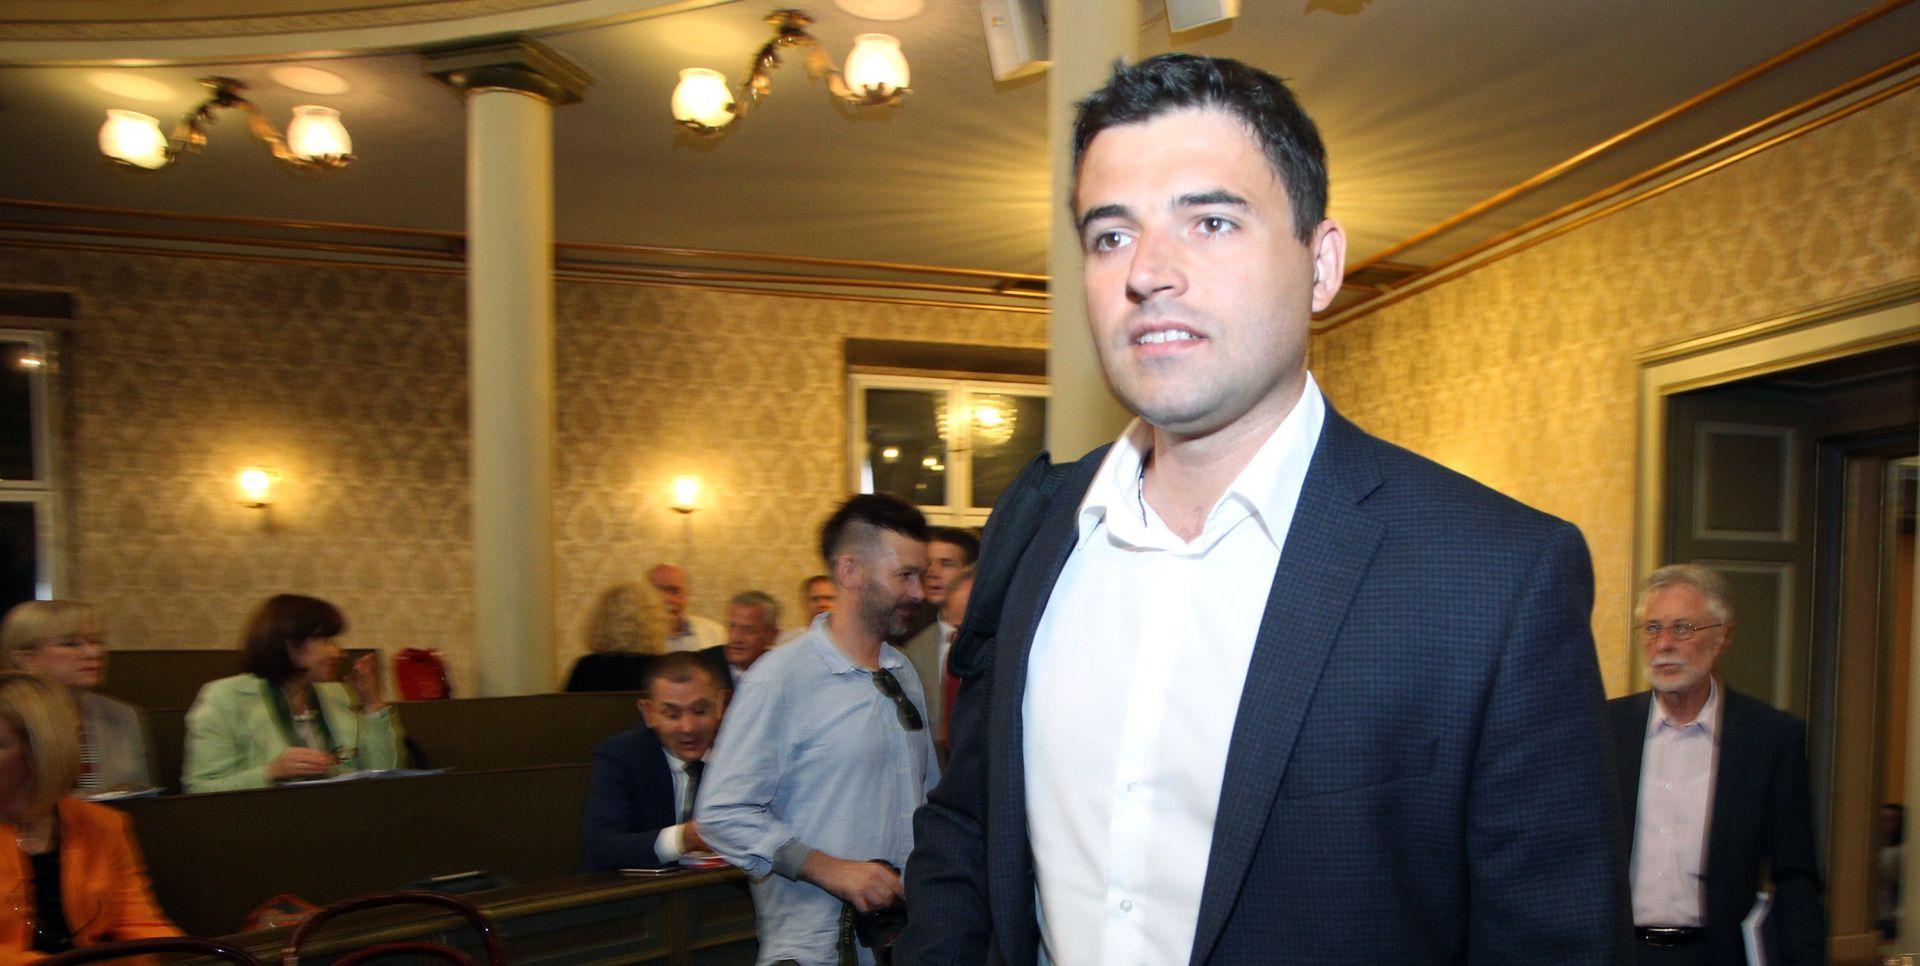 Bernardić: Blagonaklon nastup HDZ-a prema Bandiću jer su u koaliciji